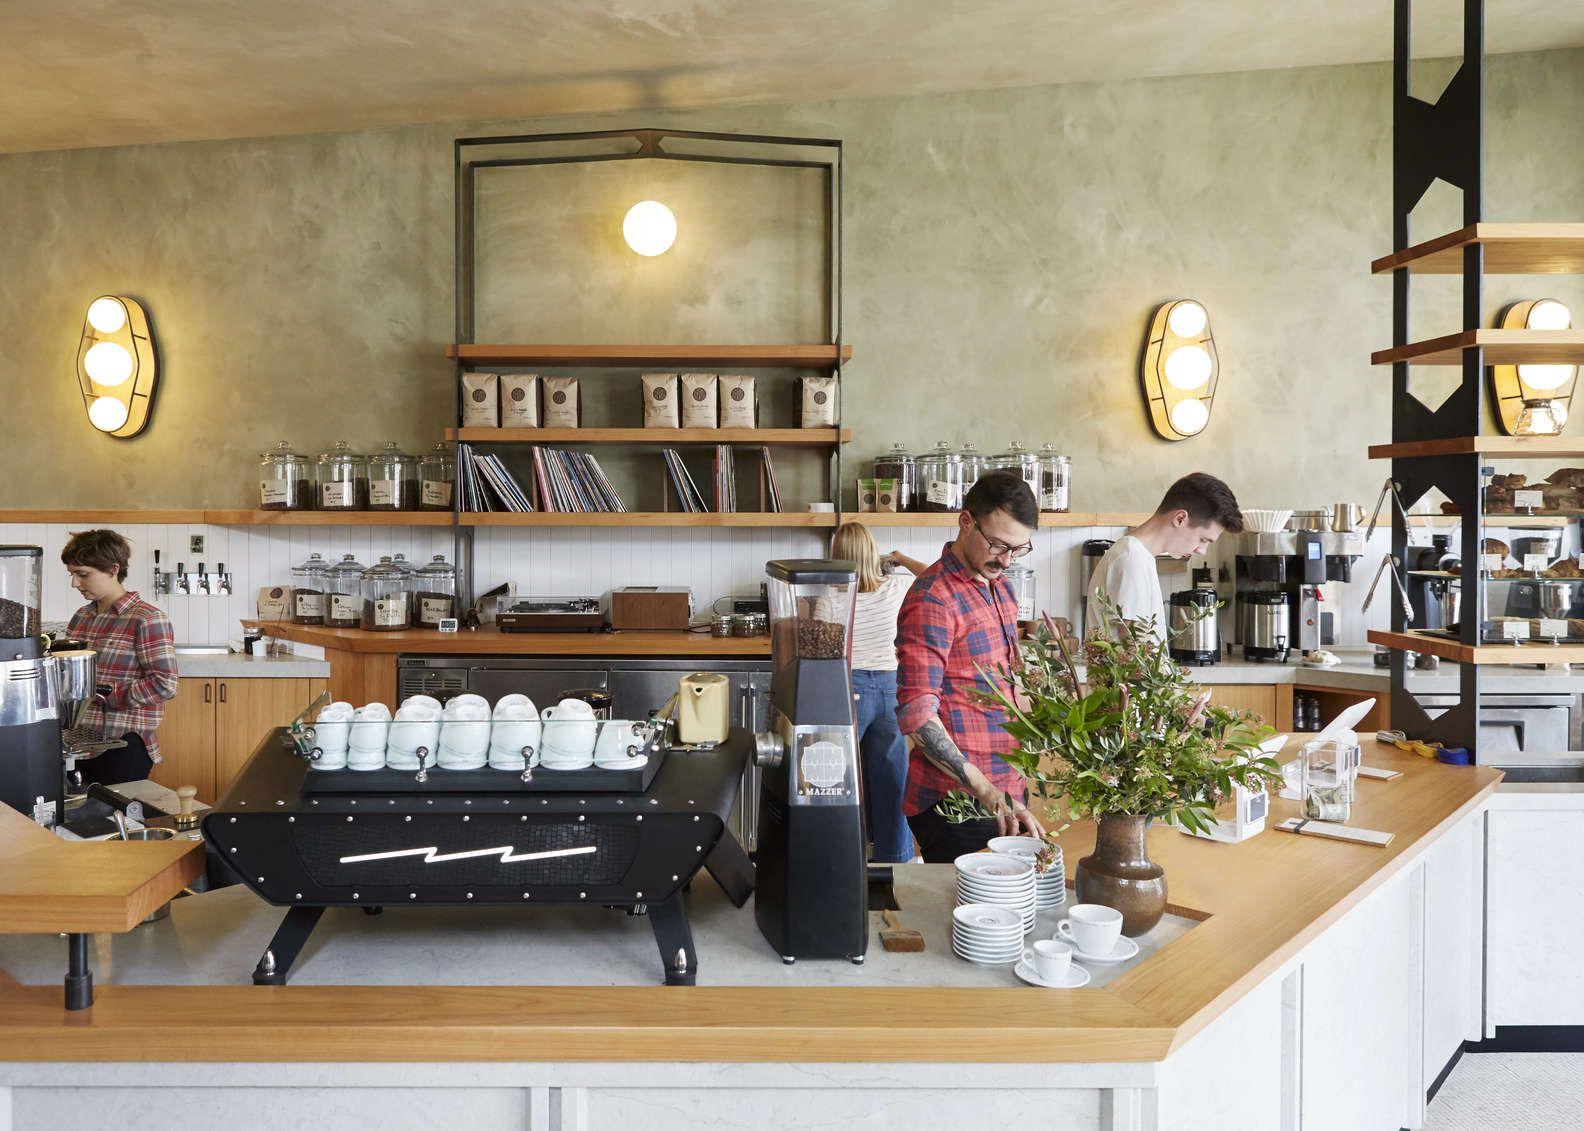 The Best Coffee Shops In San Francisco In 2020 Best Coffee Shop Coffee Shop Equipment Coffee Shop